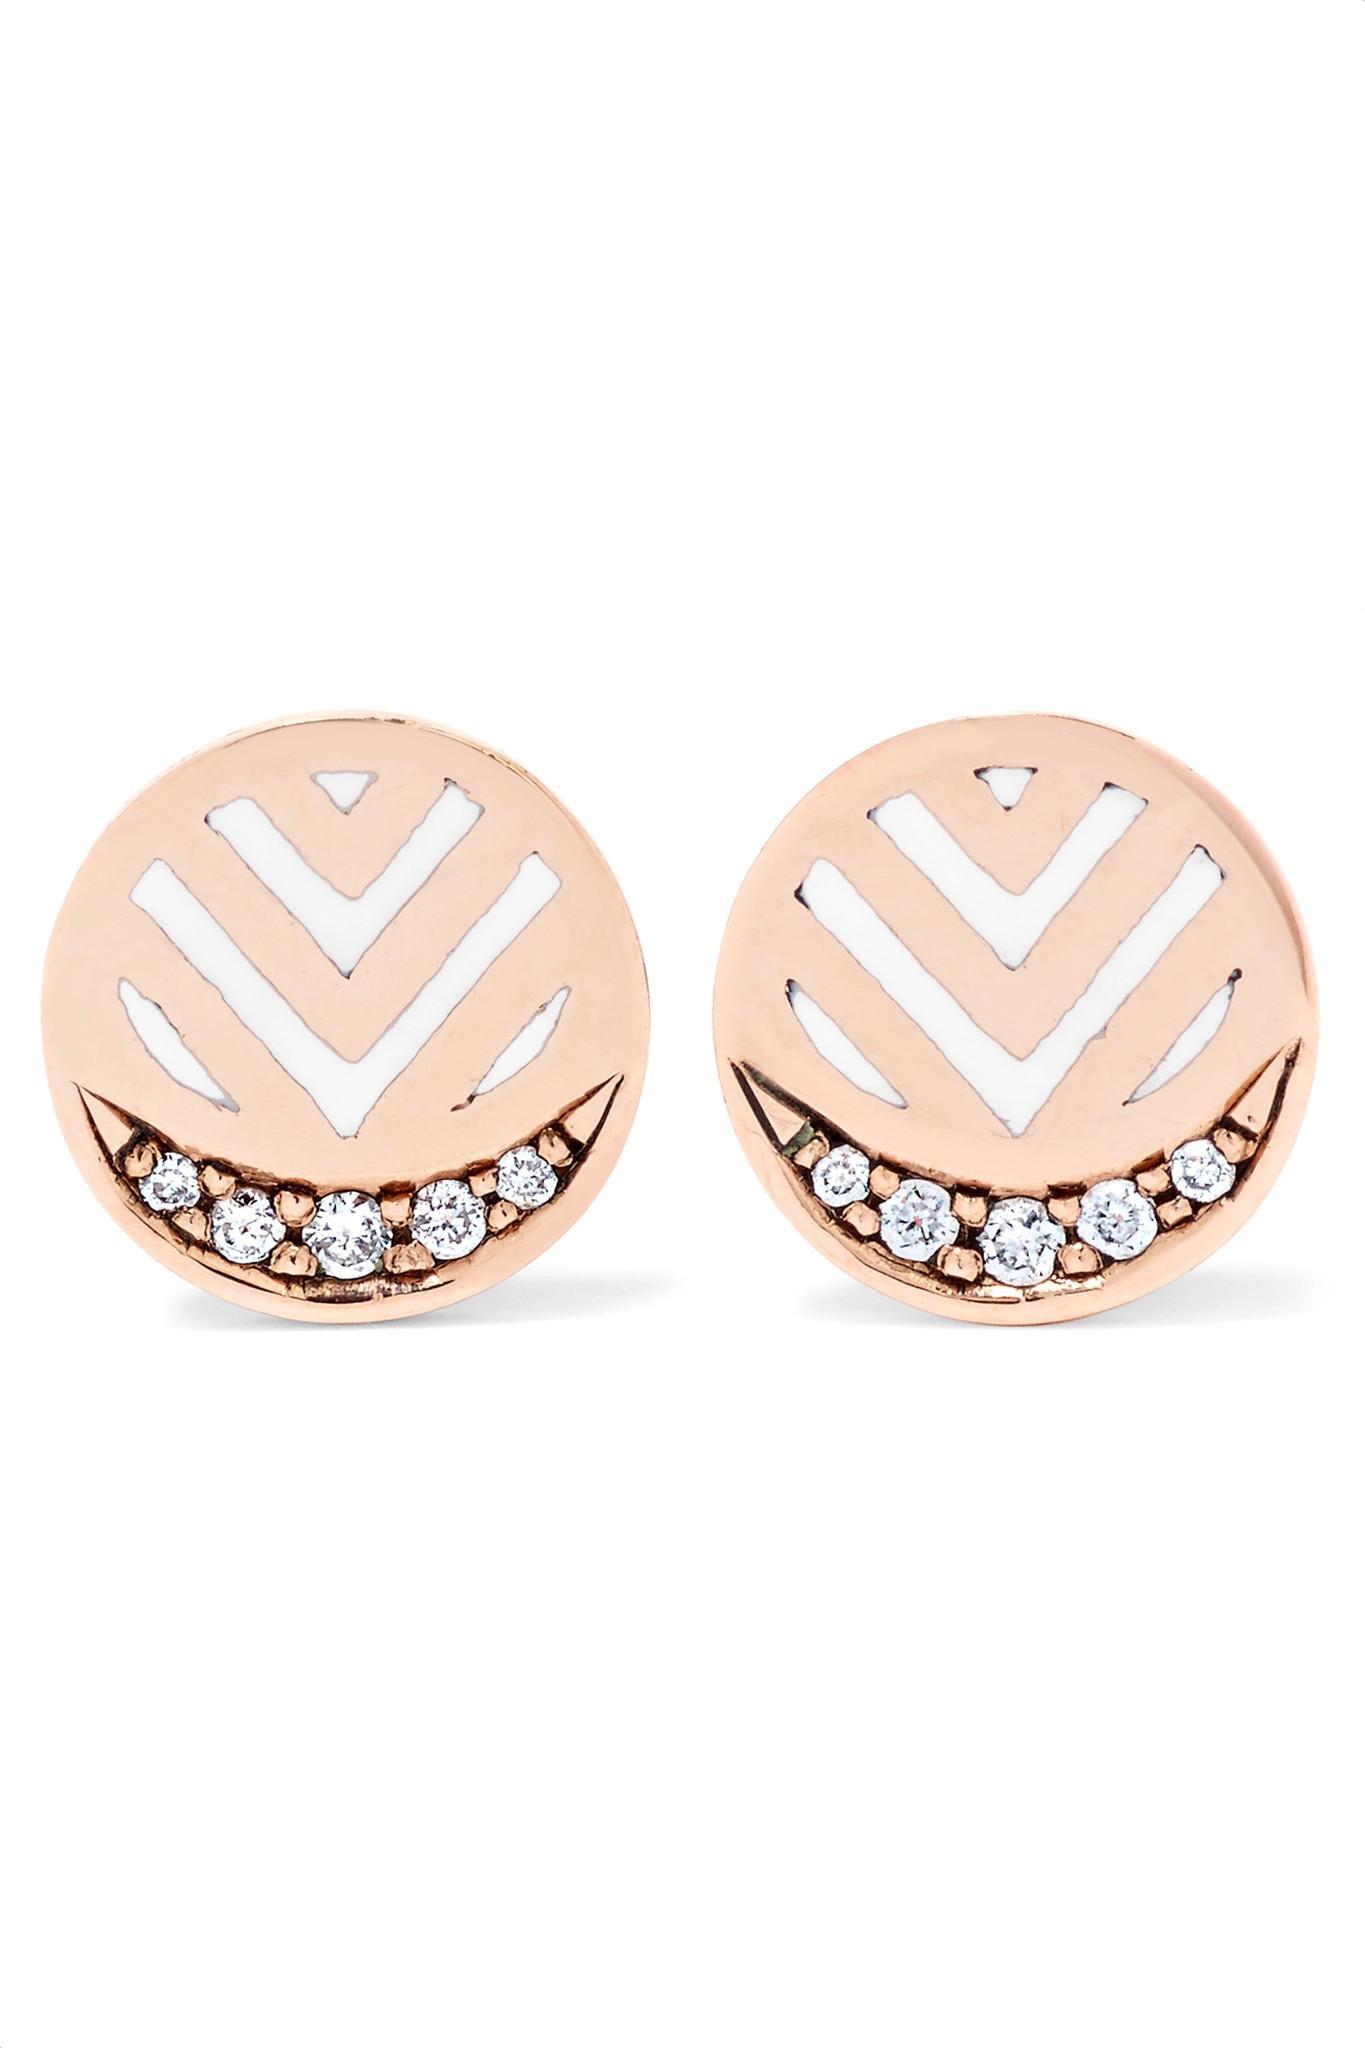 Memphis Chevron 14-karat Gold, Diamond And Enamel Earrings - one size Alice Cicolini